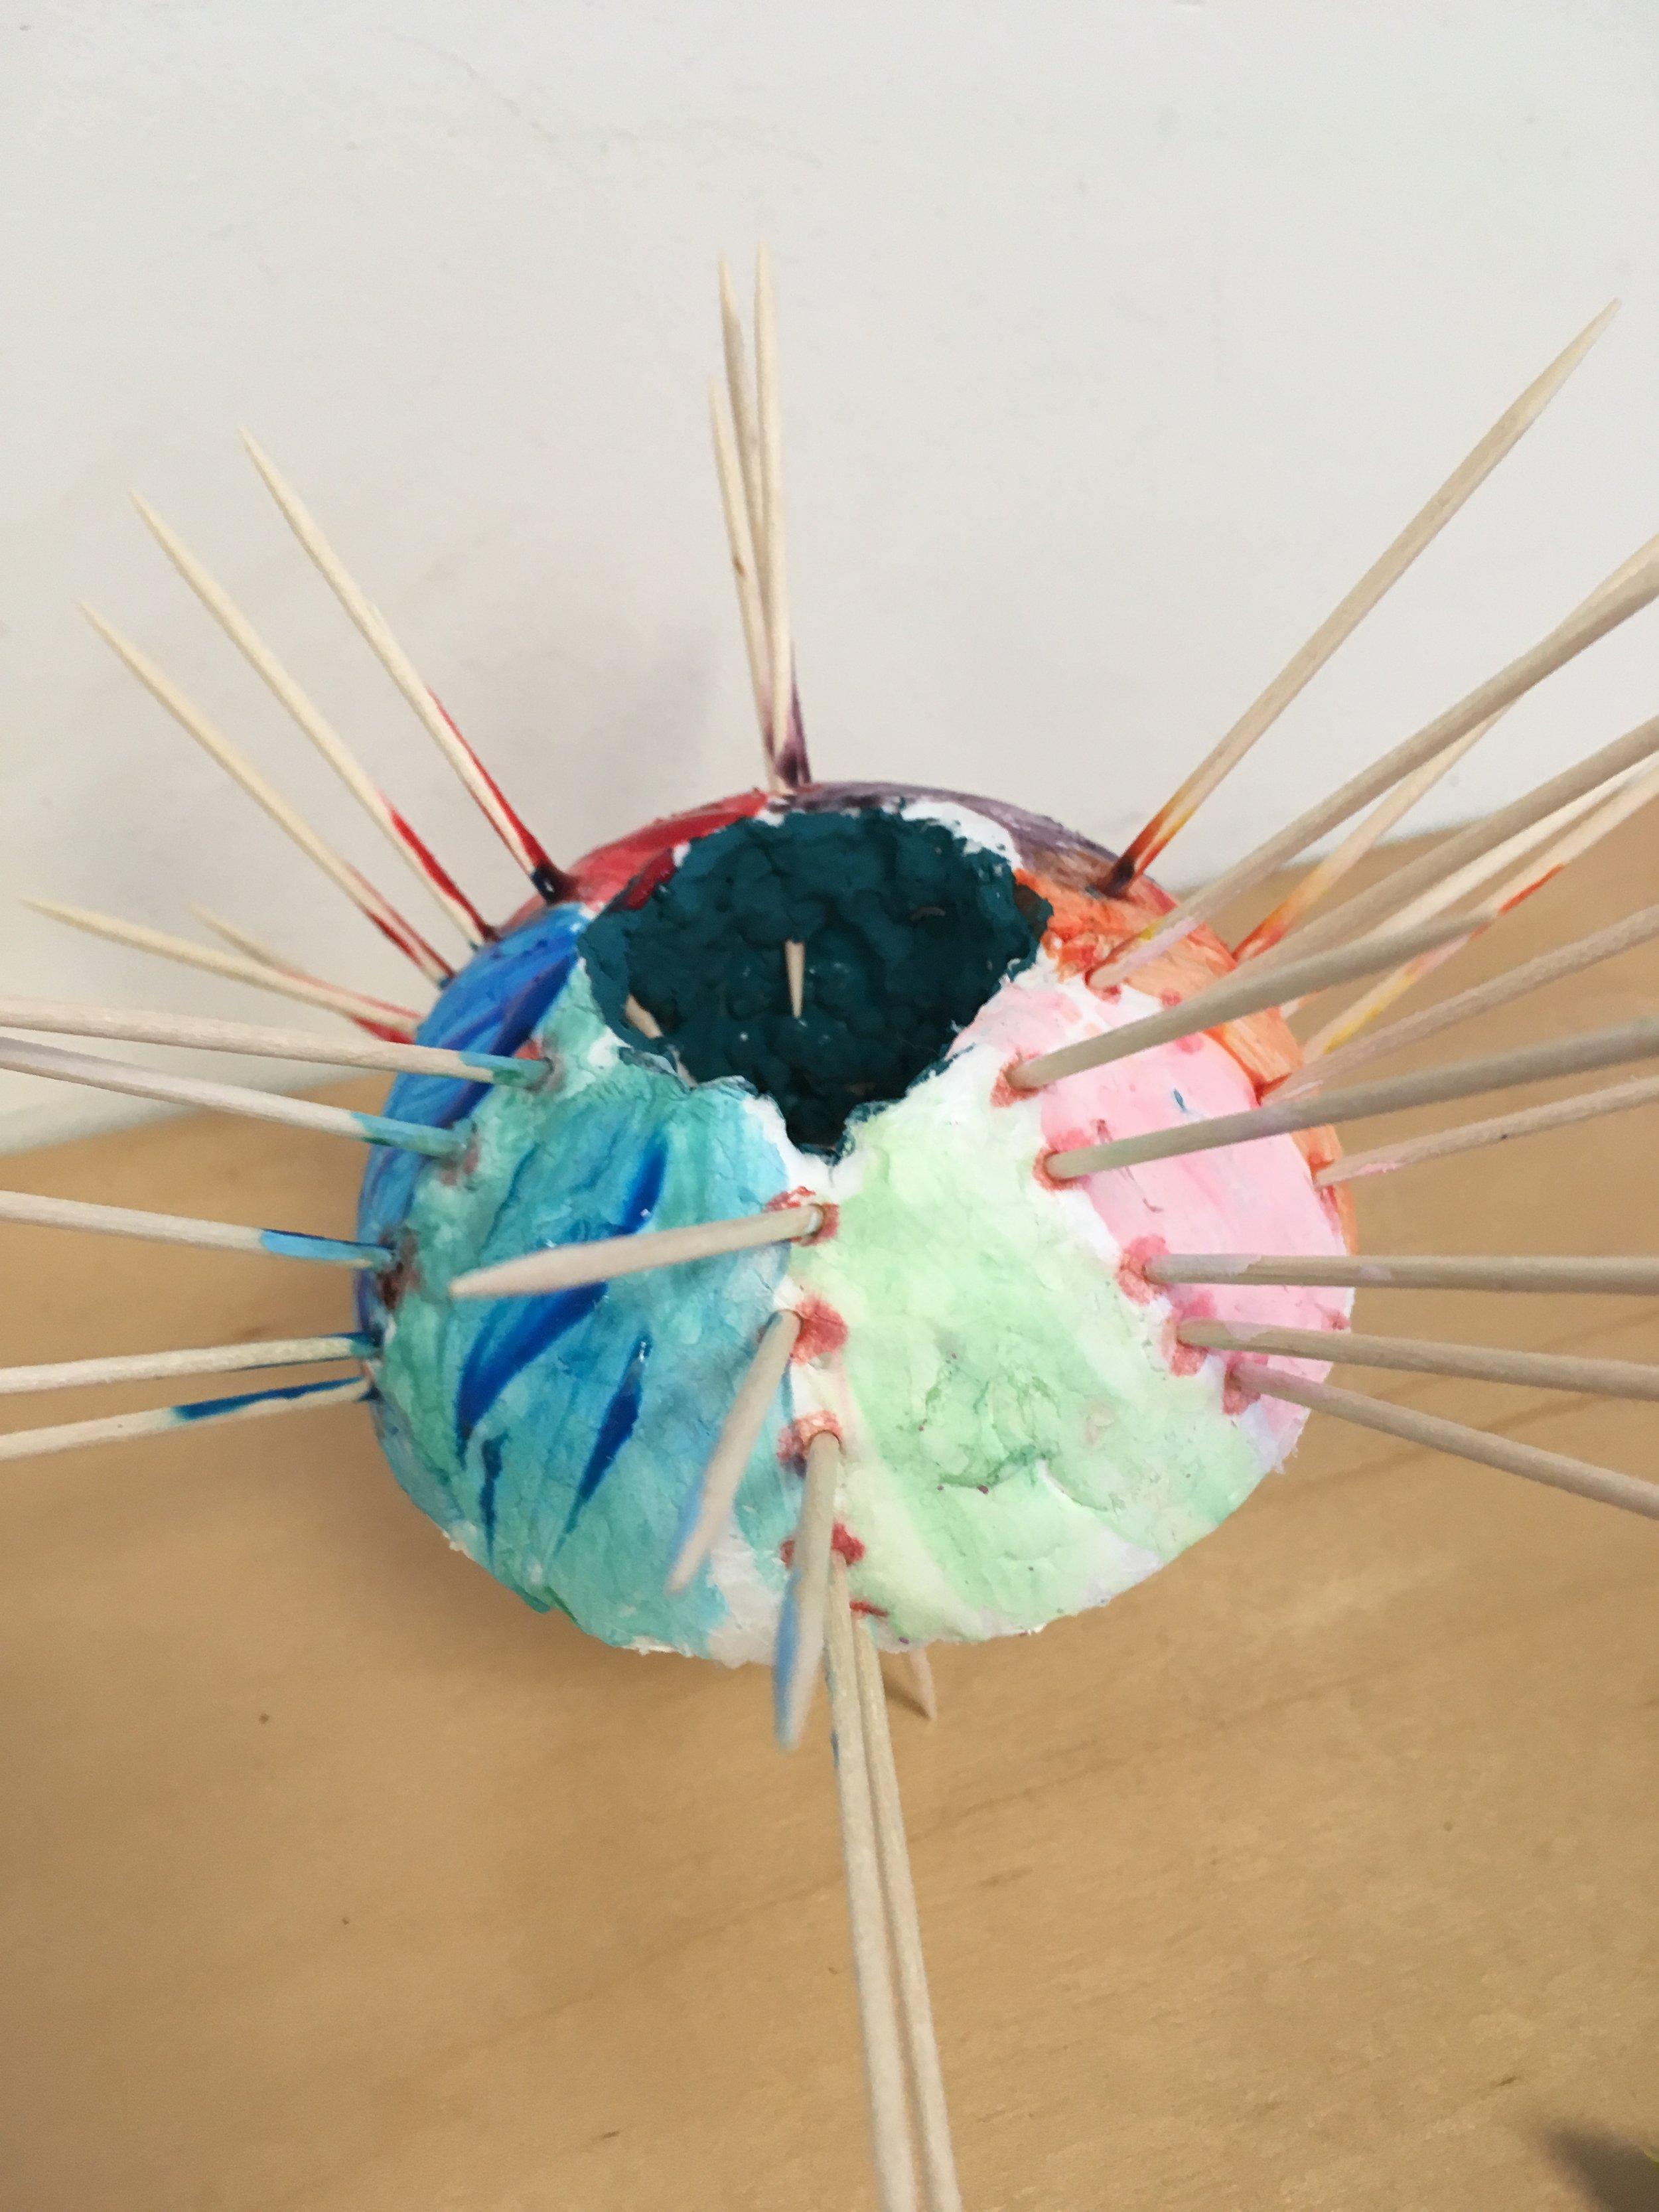 My grandson Ethan Fine's (age 7) sea urchin/ spaceship.